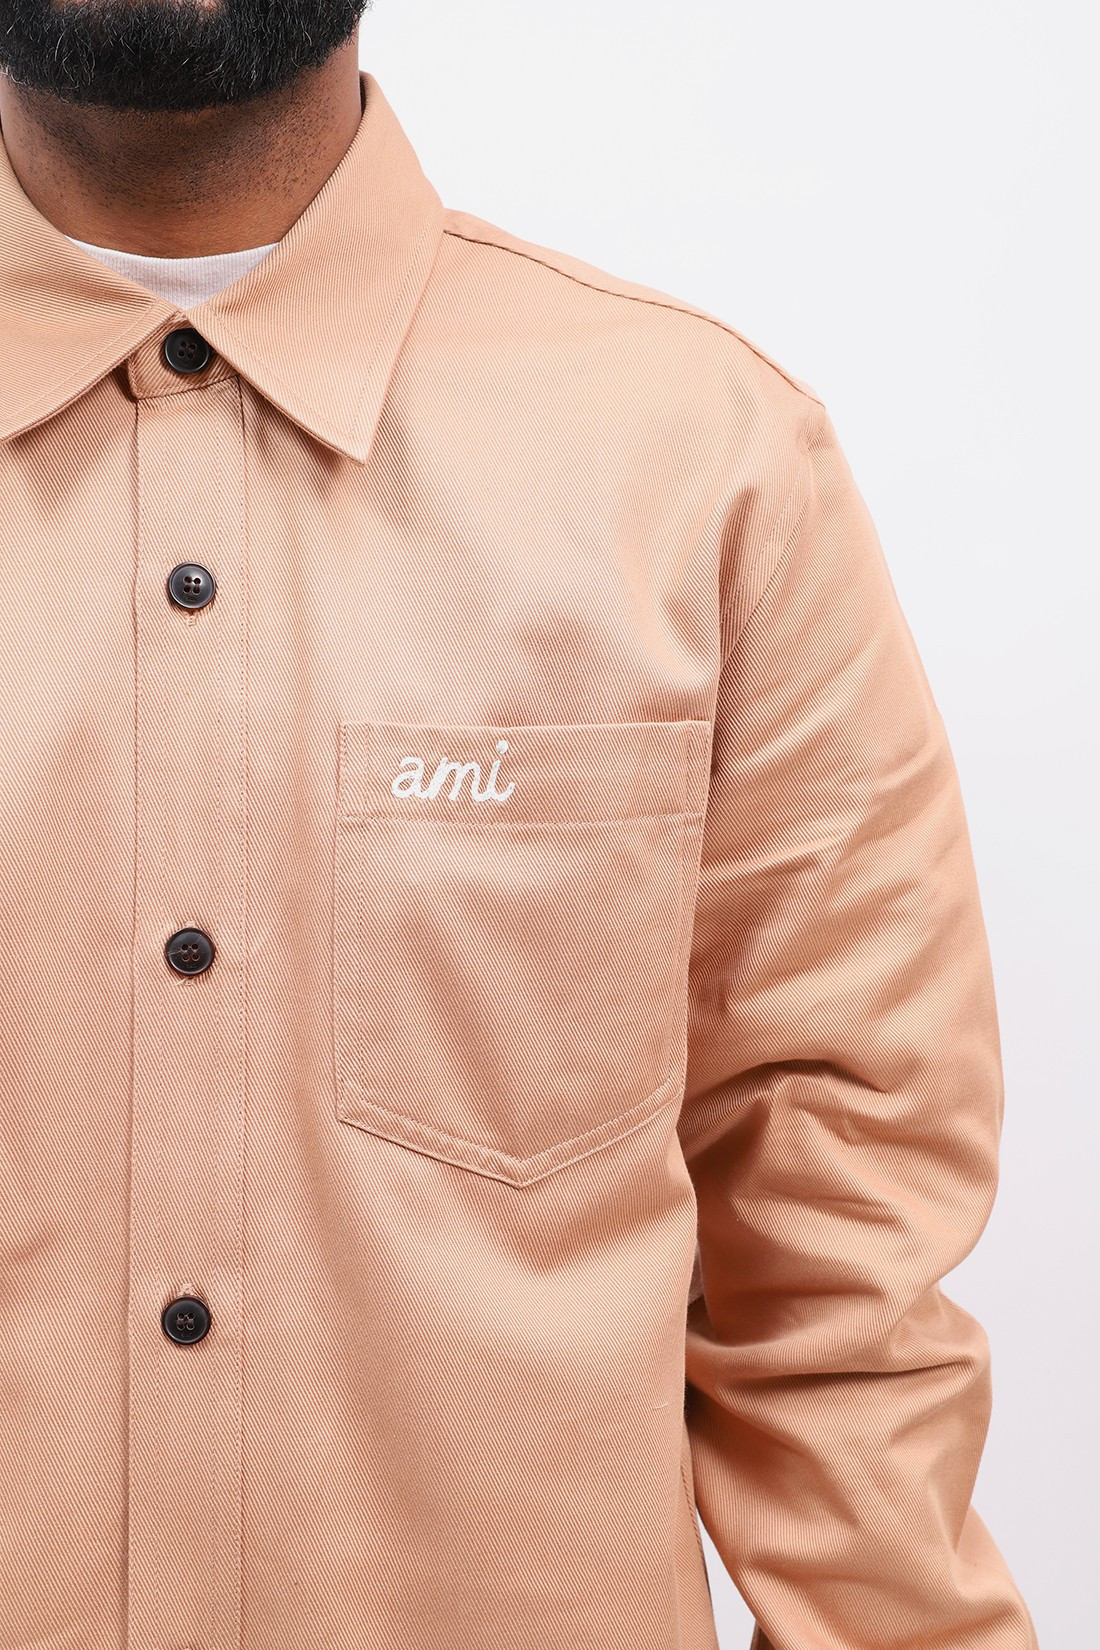 AMI / Surchemise boutonnee Beige